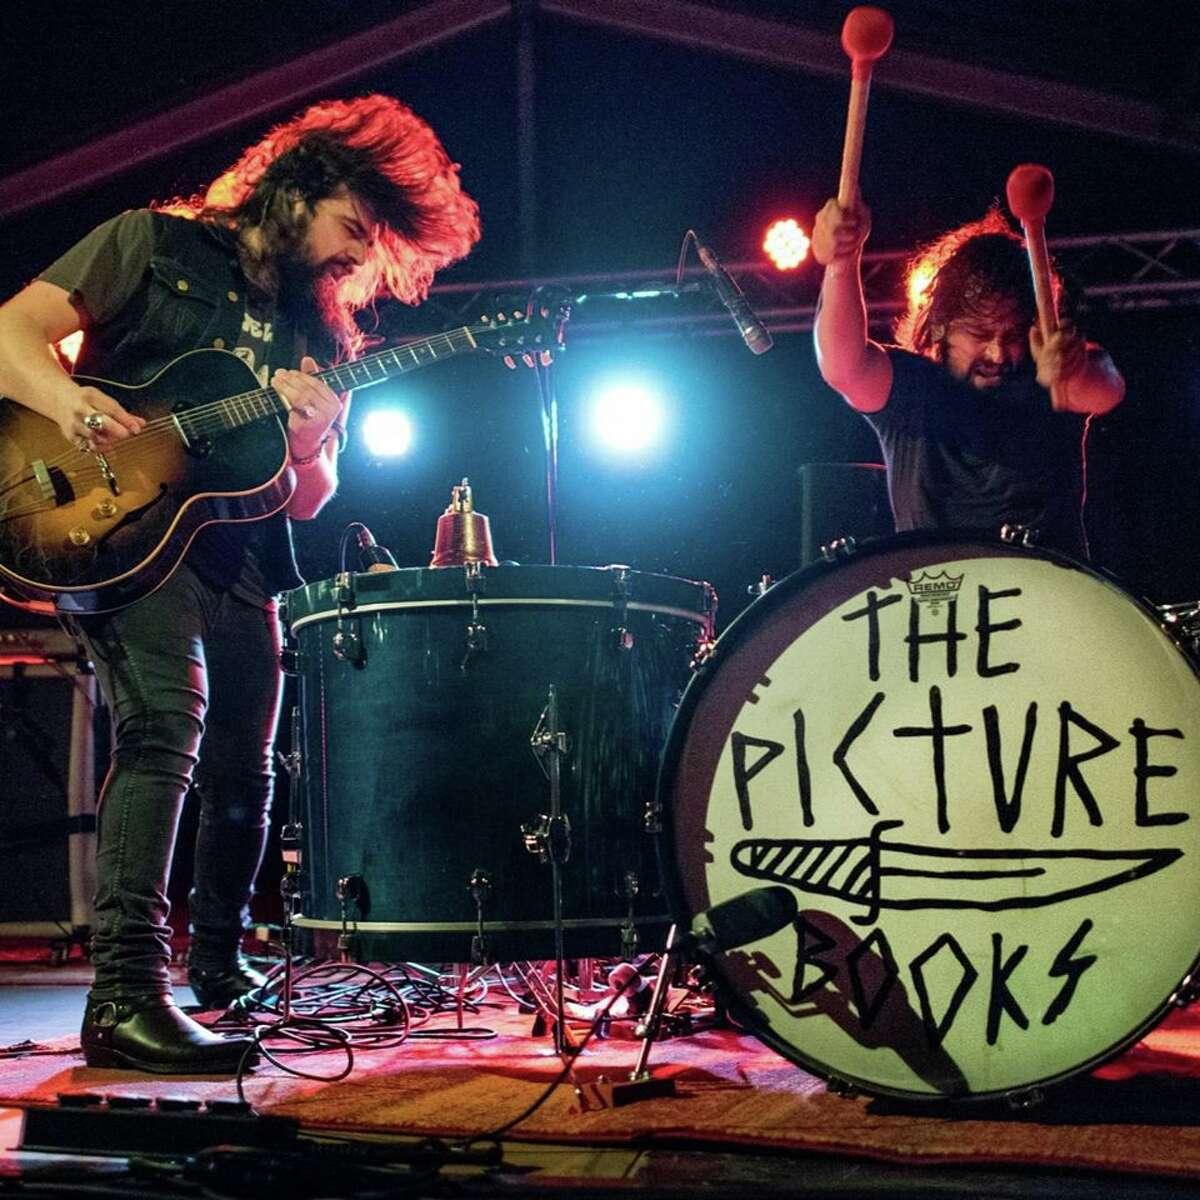 German garage rock duo of guitarist Claus Grabke and drummer Fynn Philipp Mirtschink arrives touting its latest album,